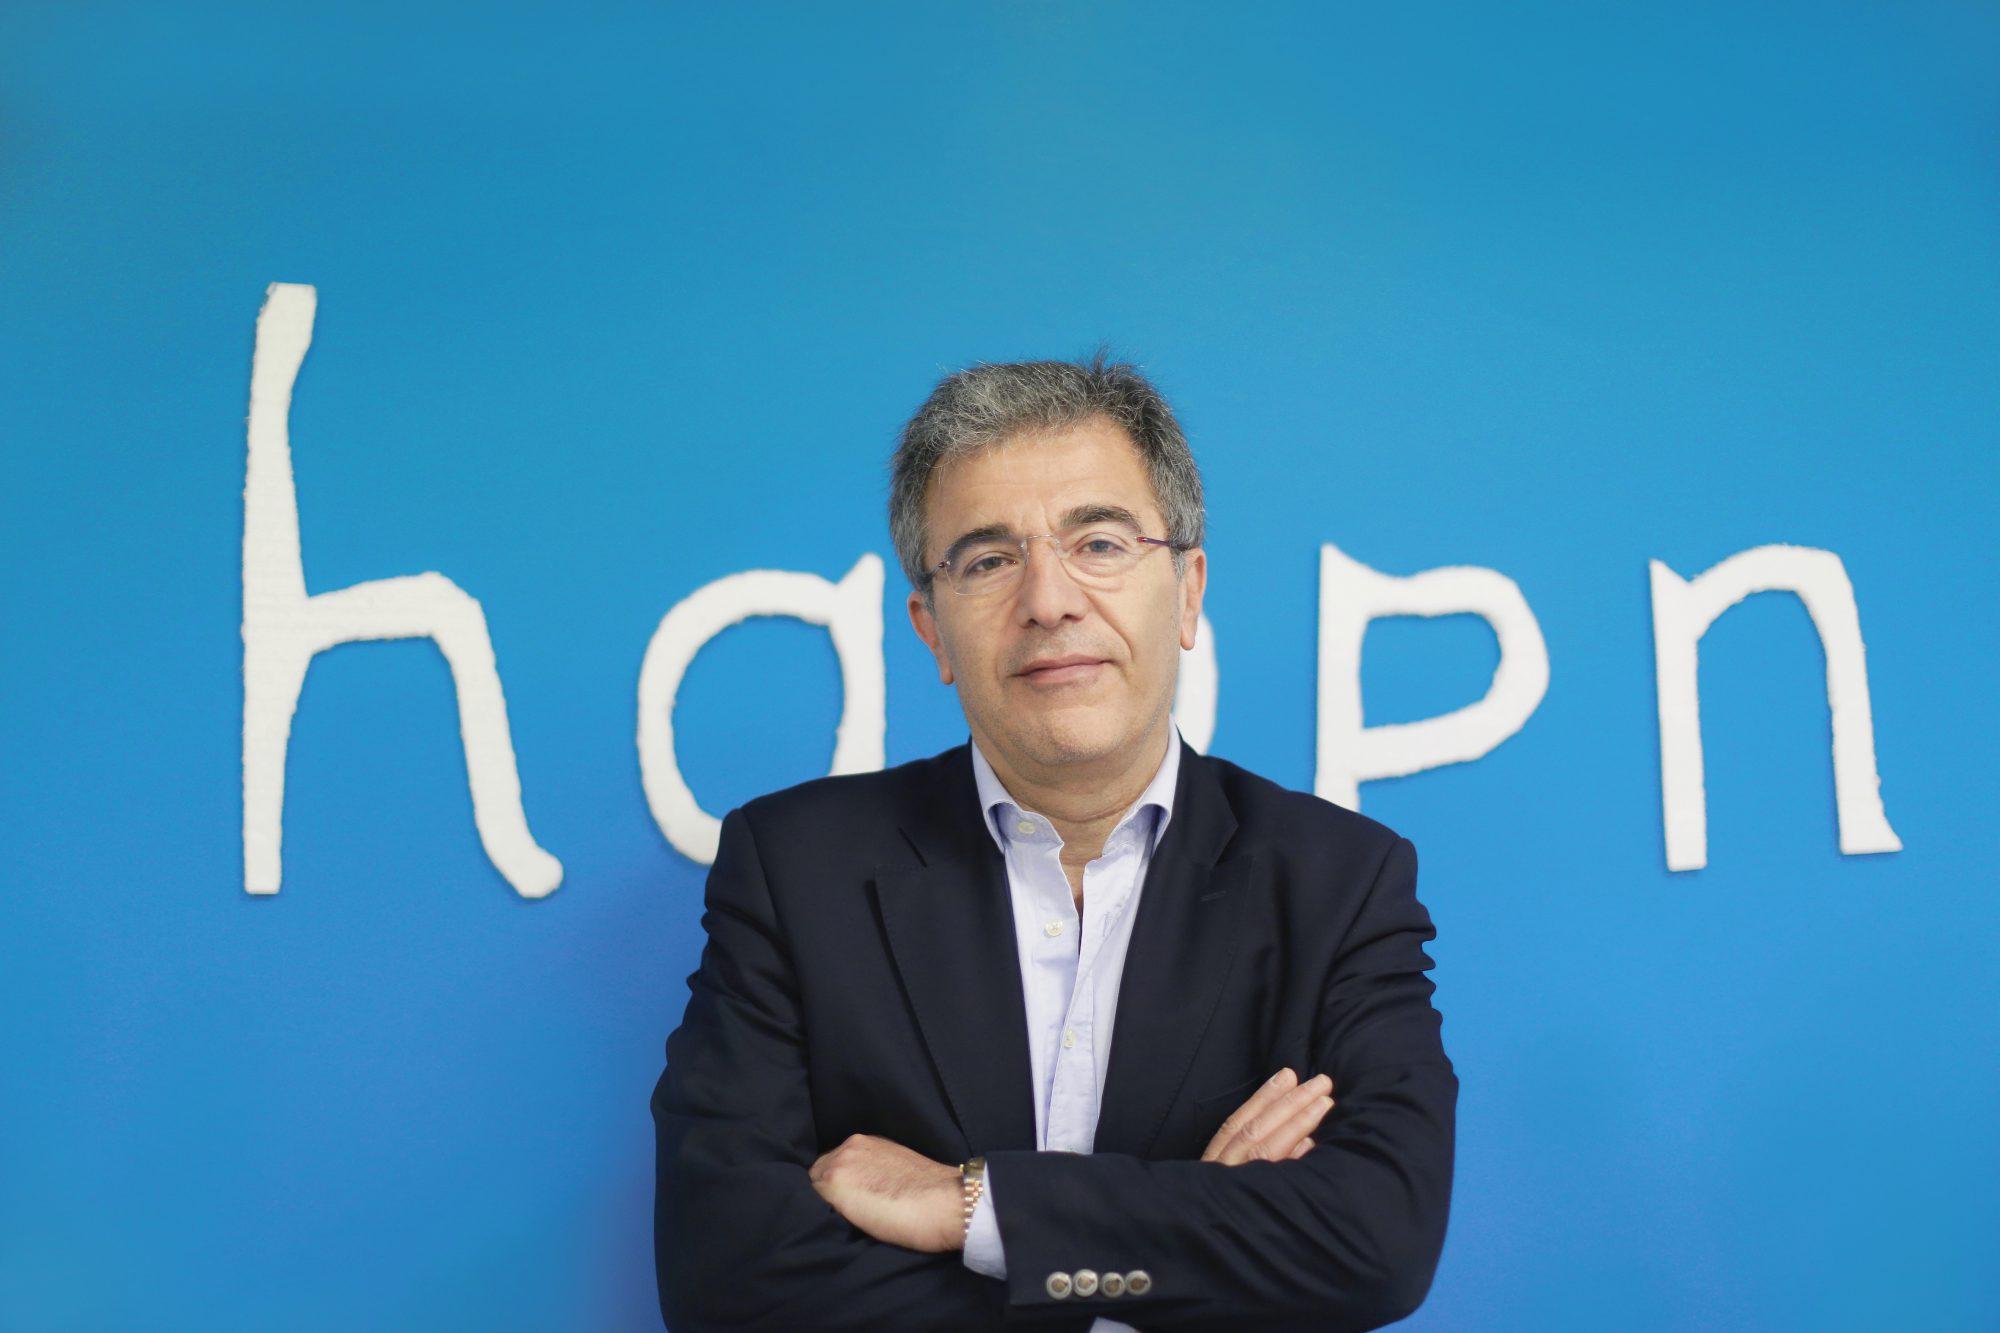 happn CEO & cofounder Didier Rappaport